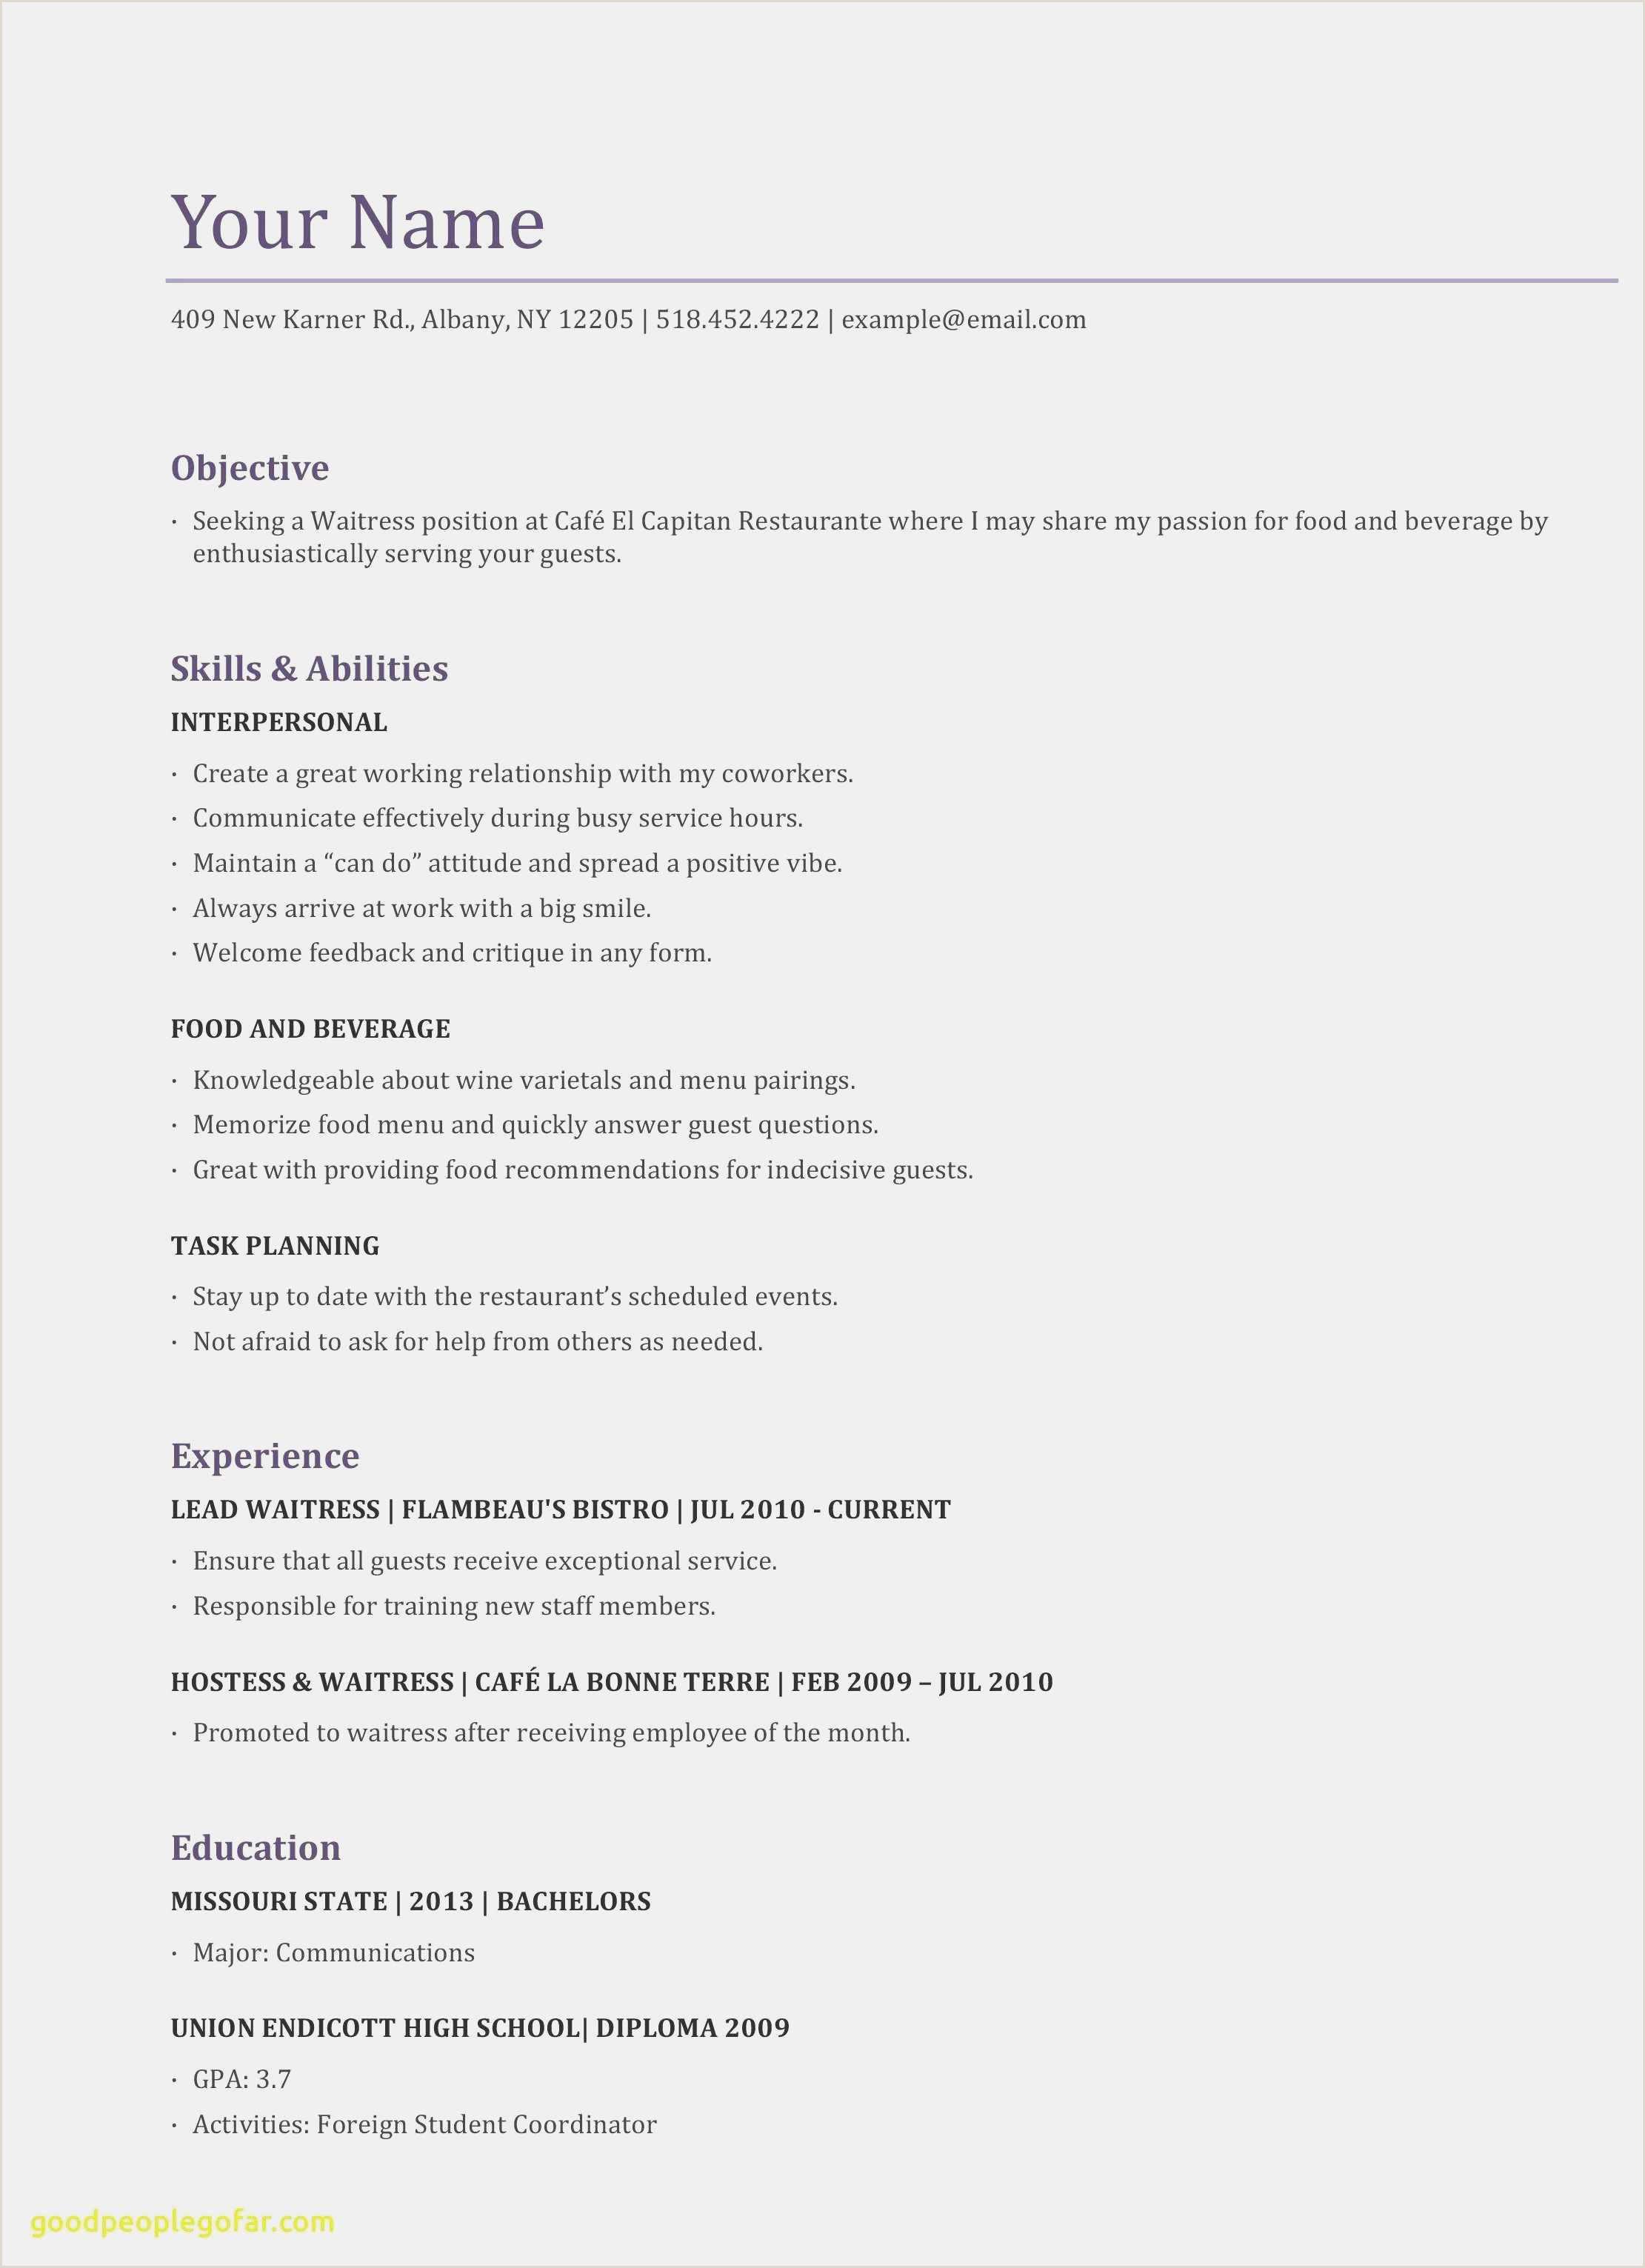 Waitress Resume Skills Free Download 57 Resume Templat Professional